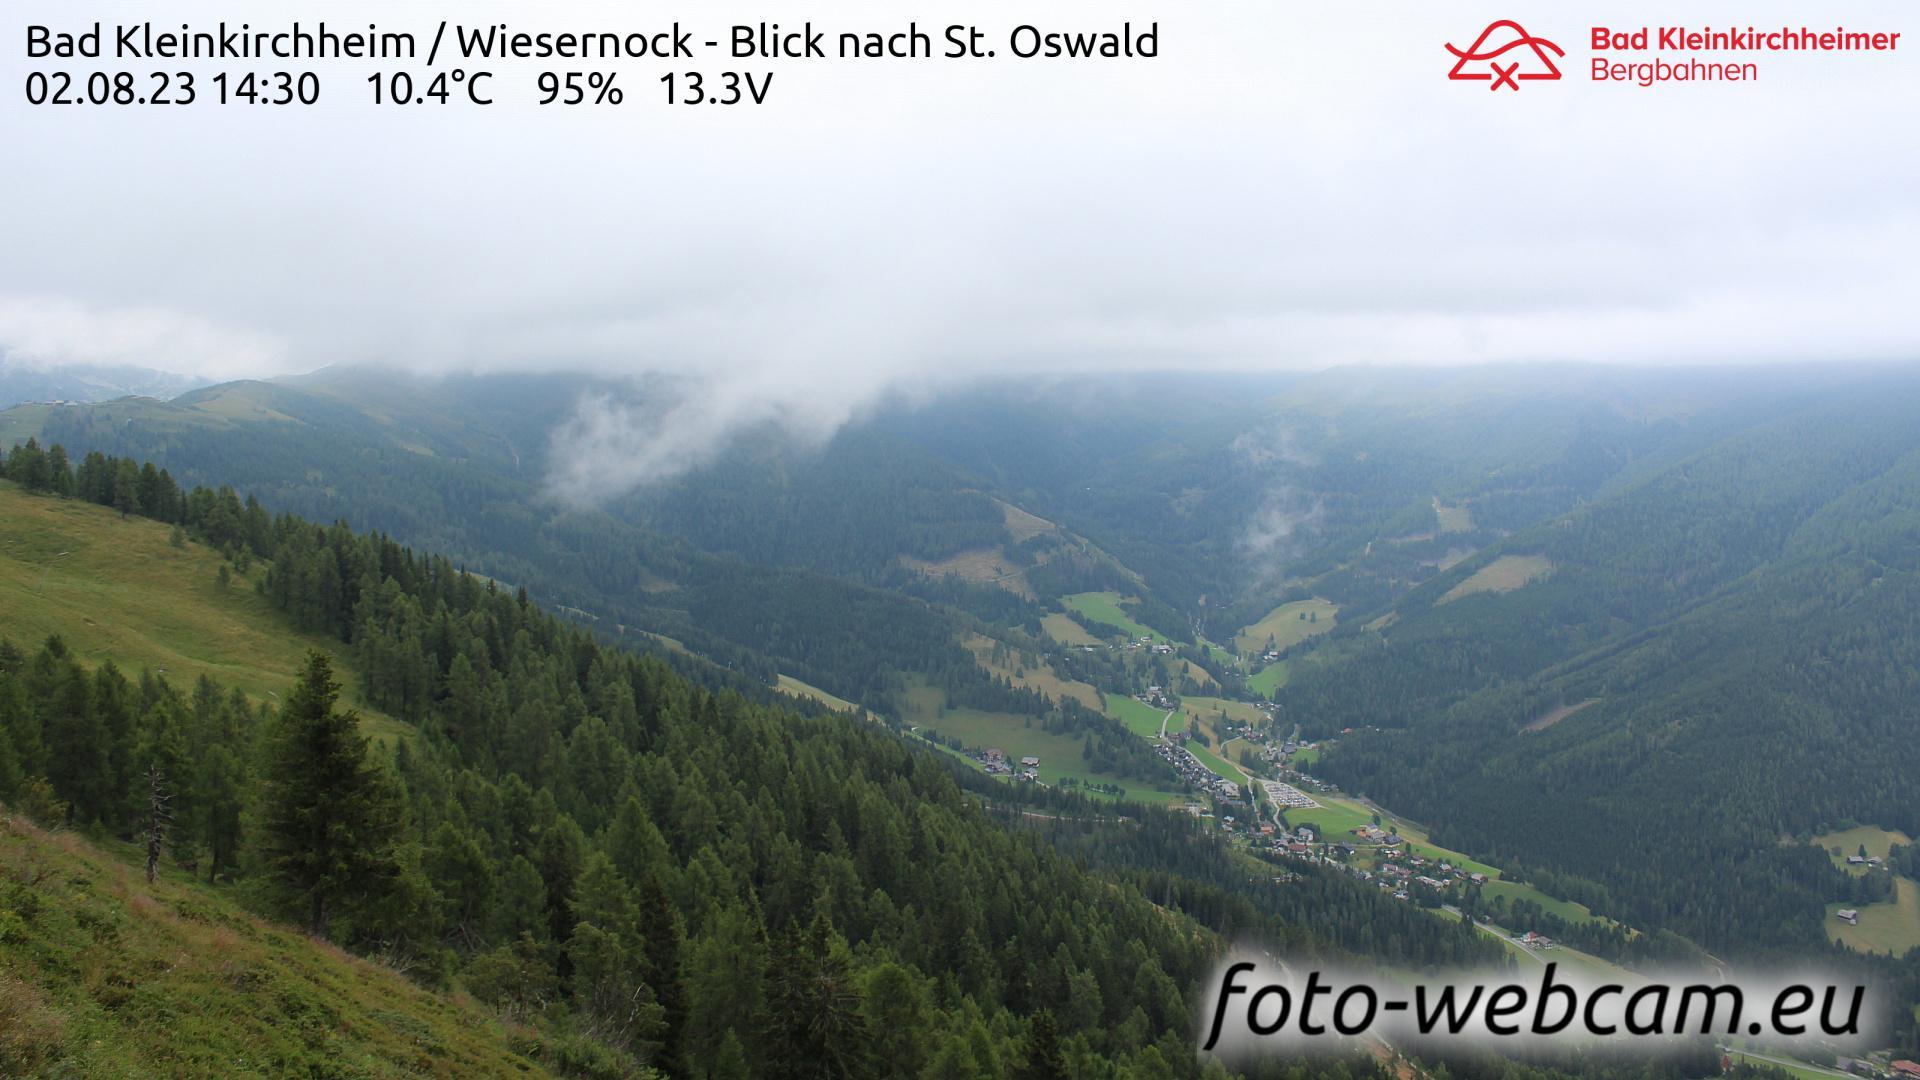 Webcam Staudach: Bad Kleinkirchheim − Wiesernock − Blick